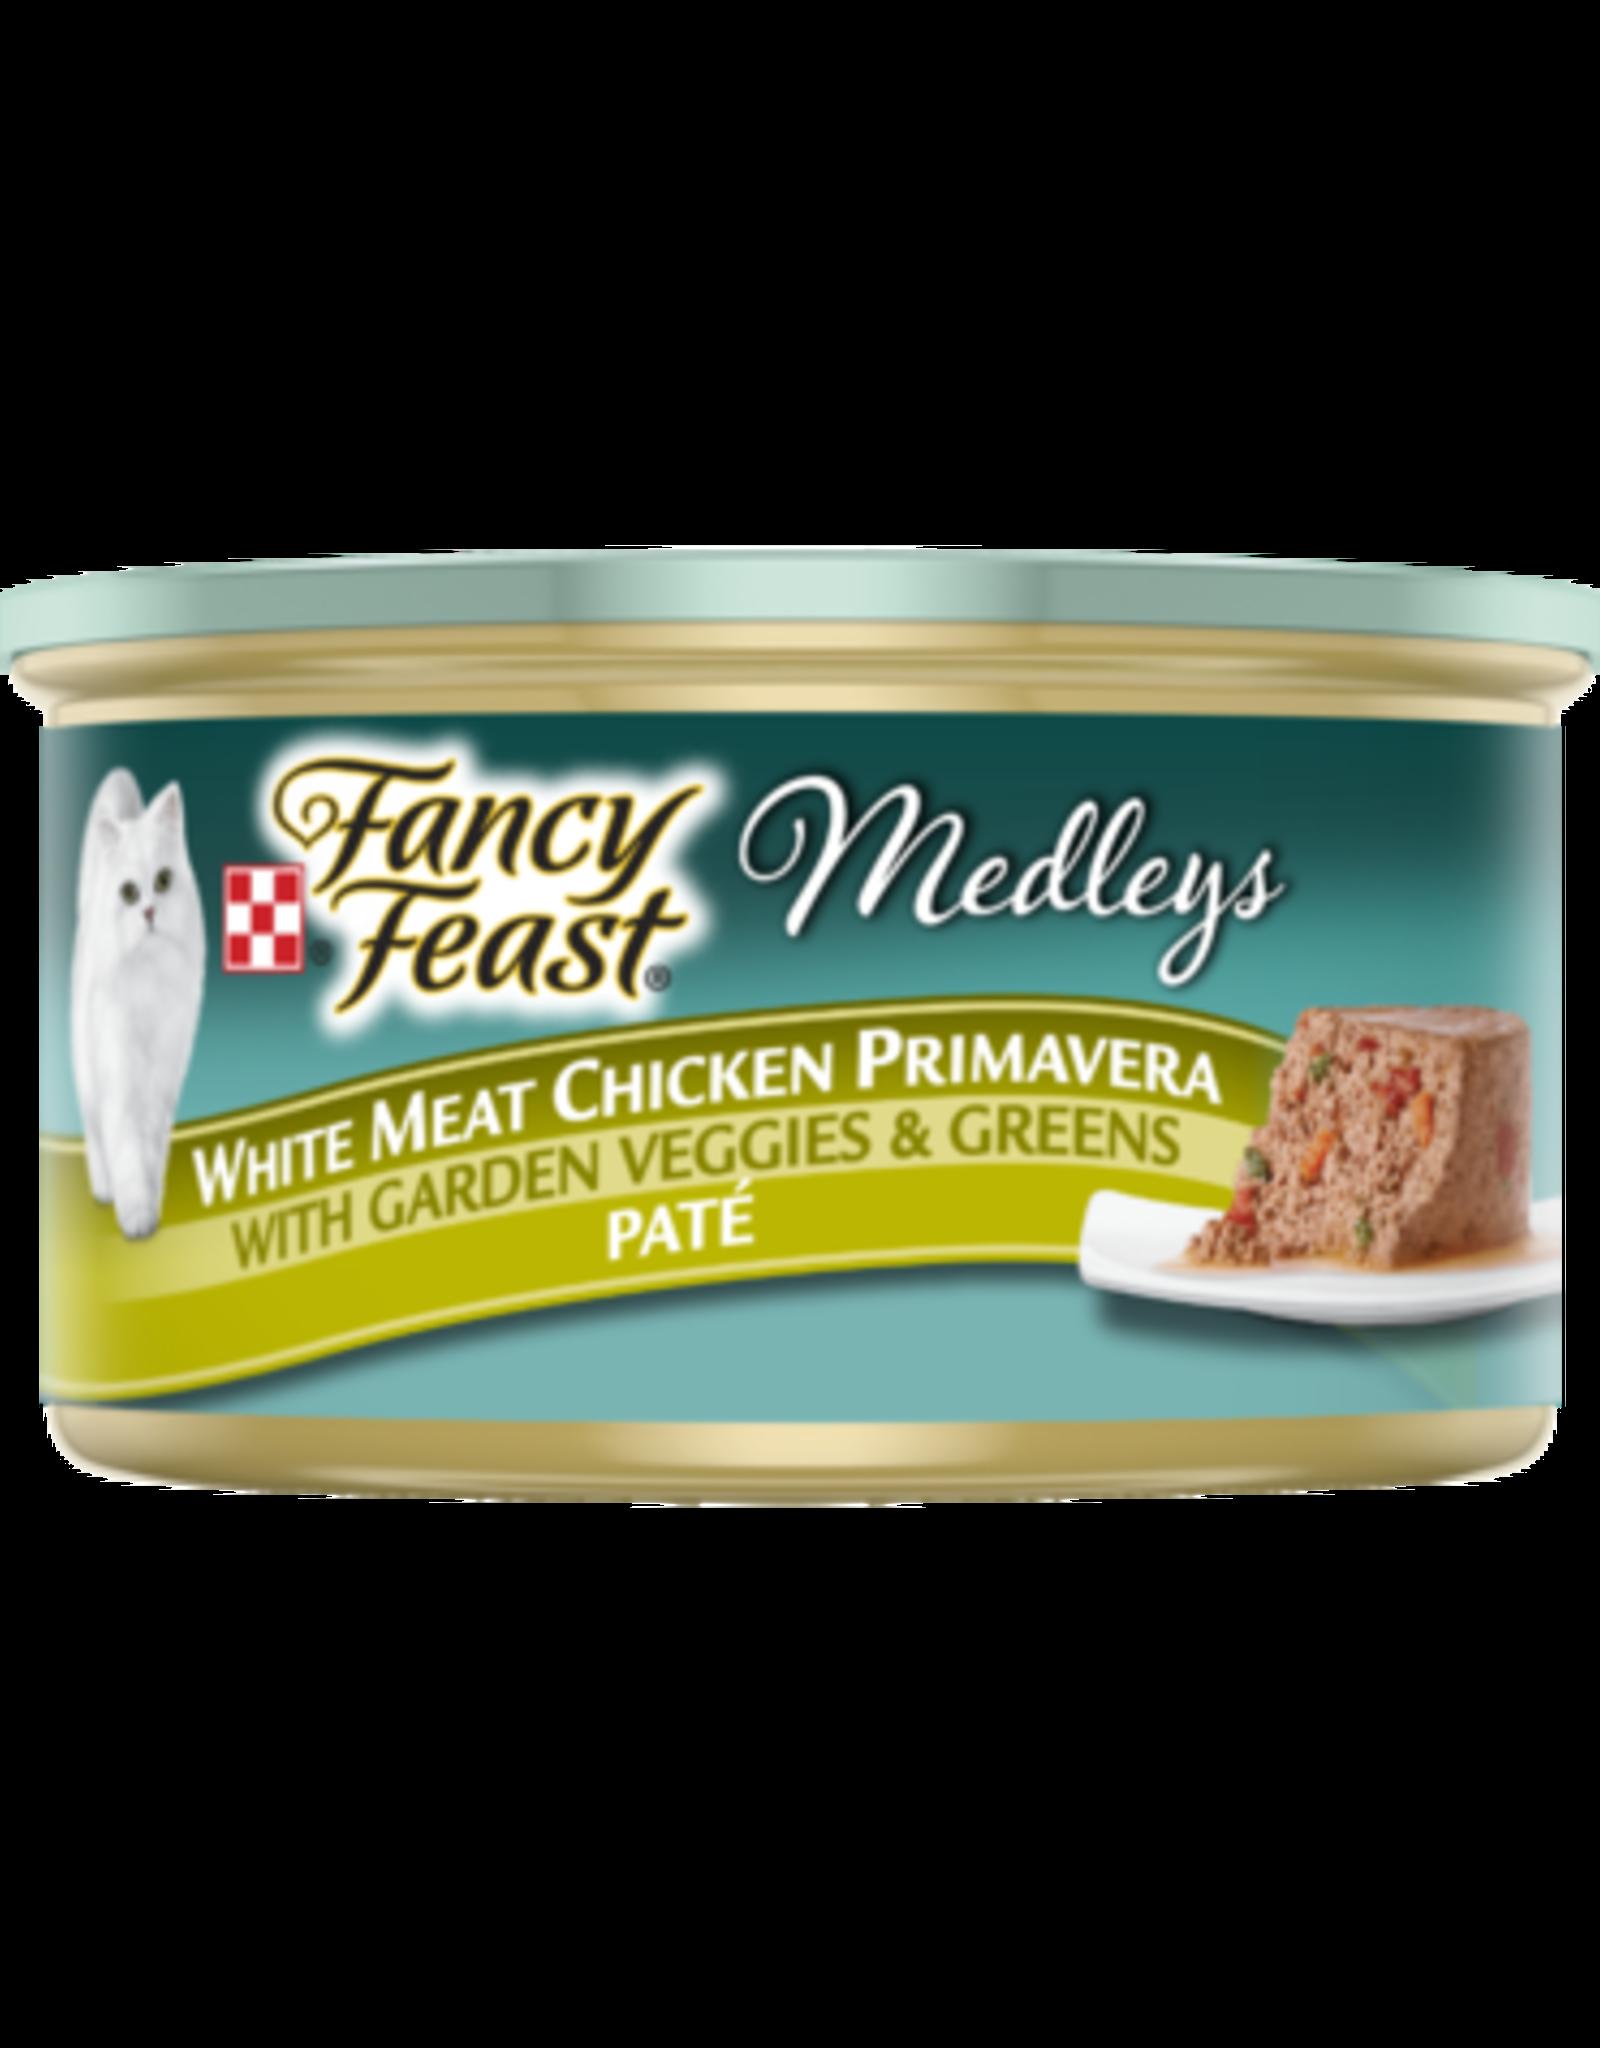 FANCY FEAST MEDLEYS CHICKEN PRIMAVERA PATE 3OZ CASE OF 24